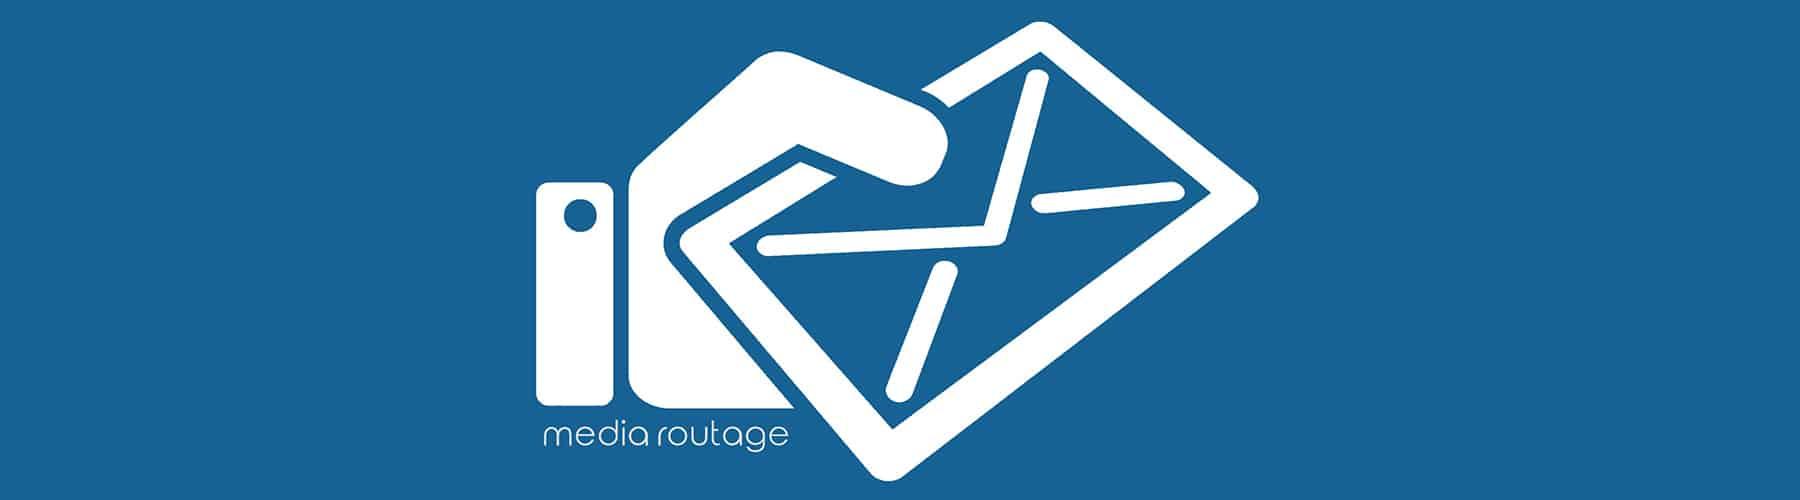 pictogramme courrier publipostage enveloppe